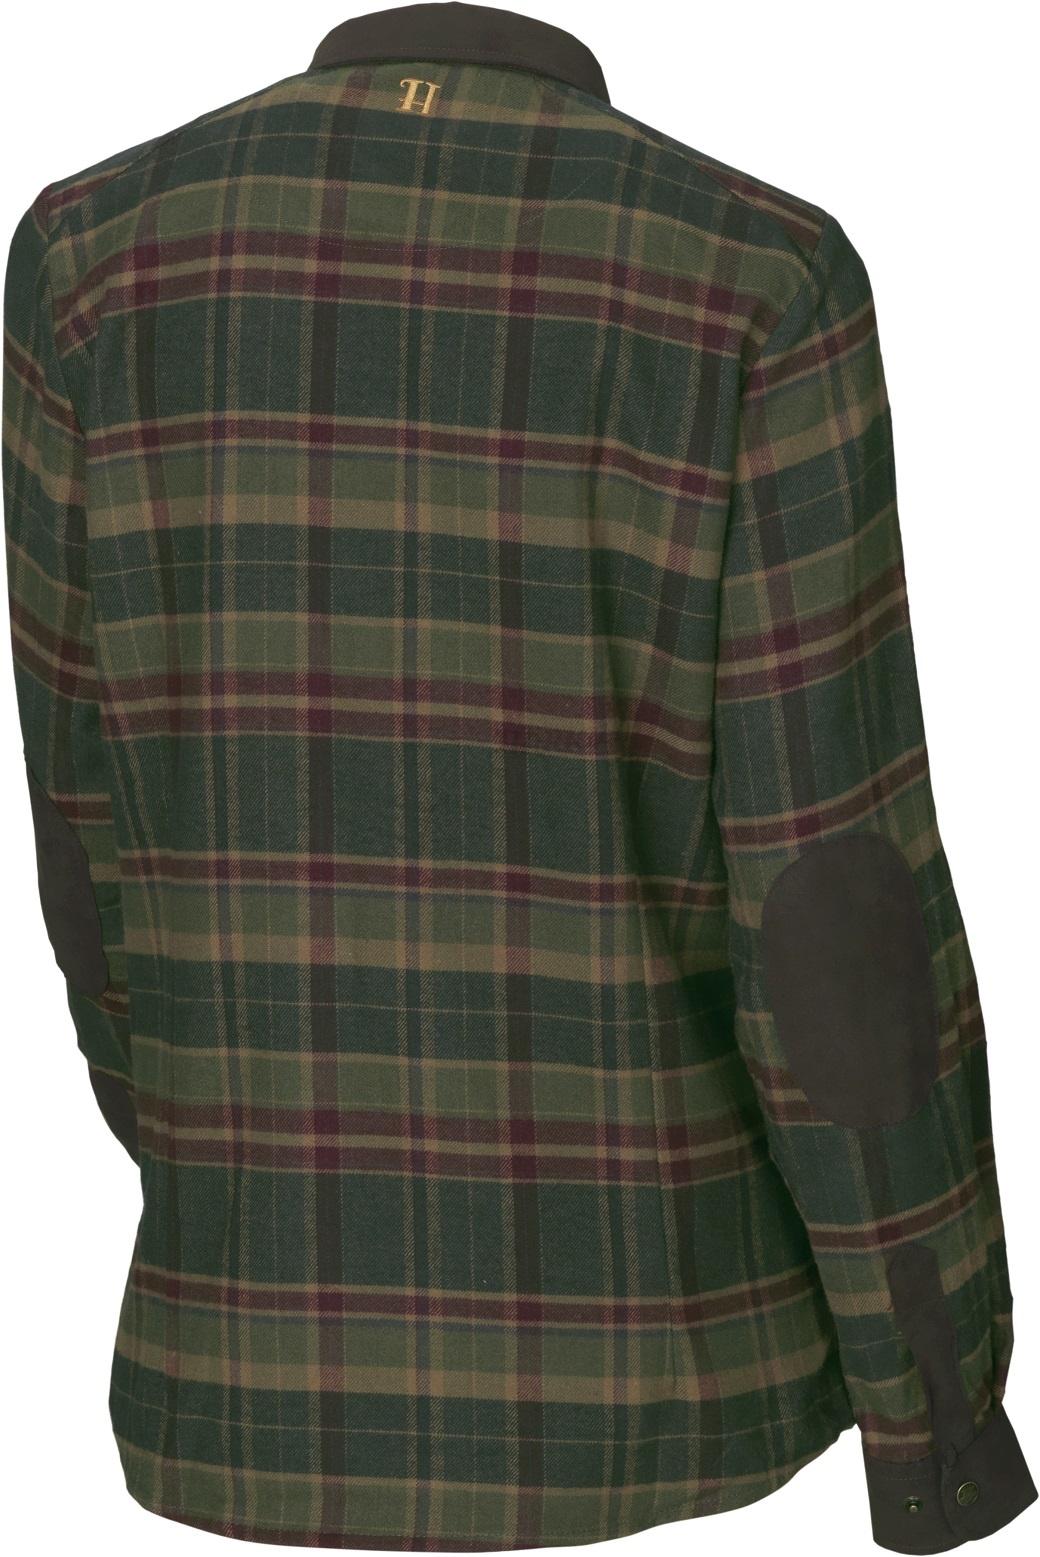 Härkila Pajala Lady L/S Shirt Rosin Green Check-2